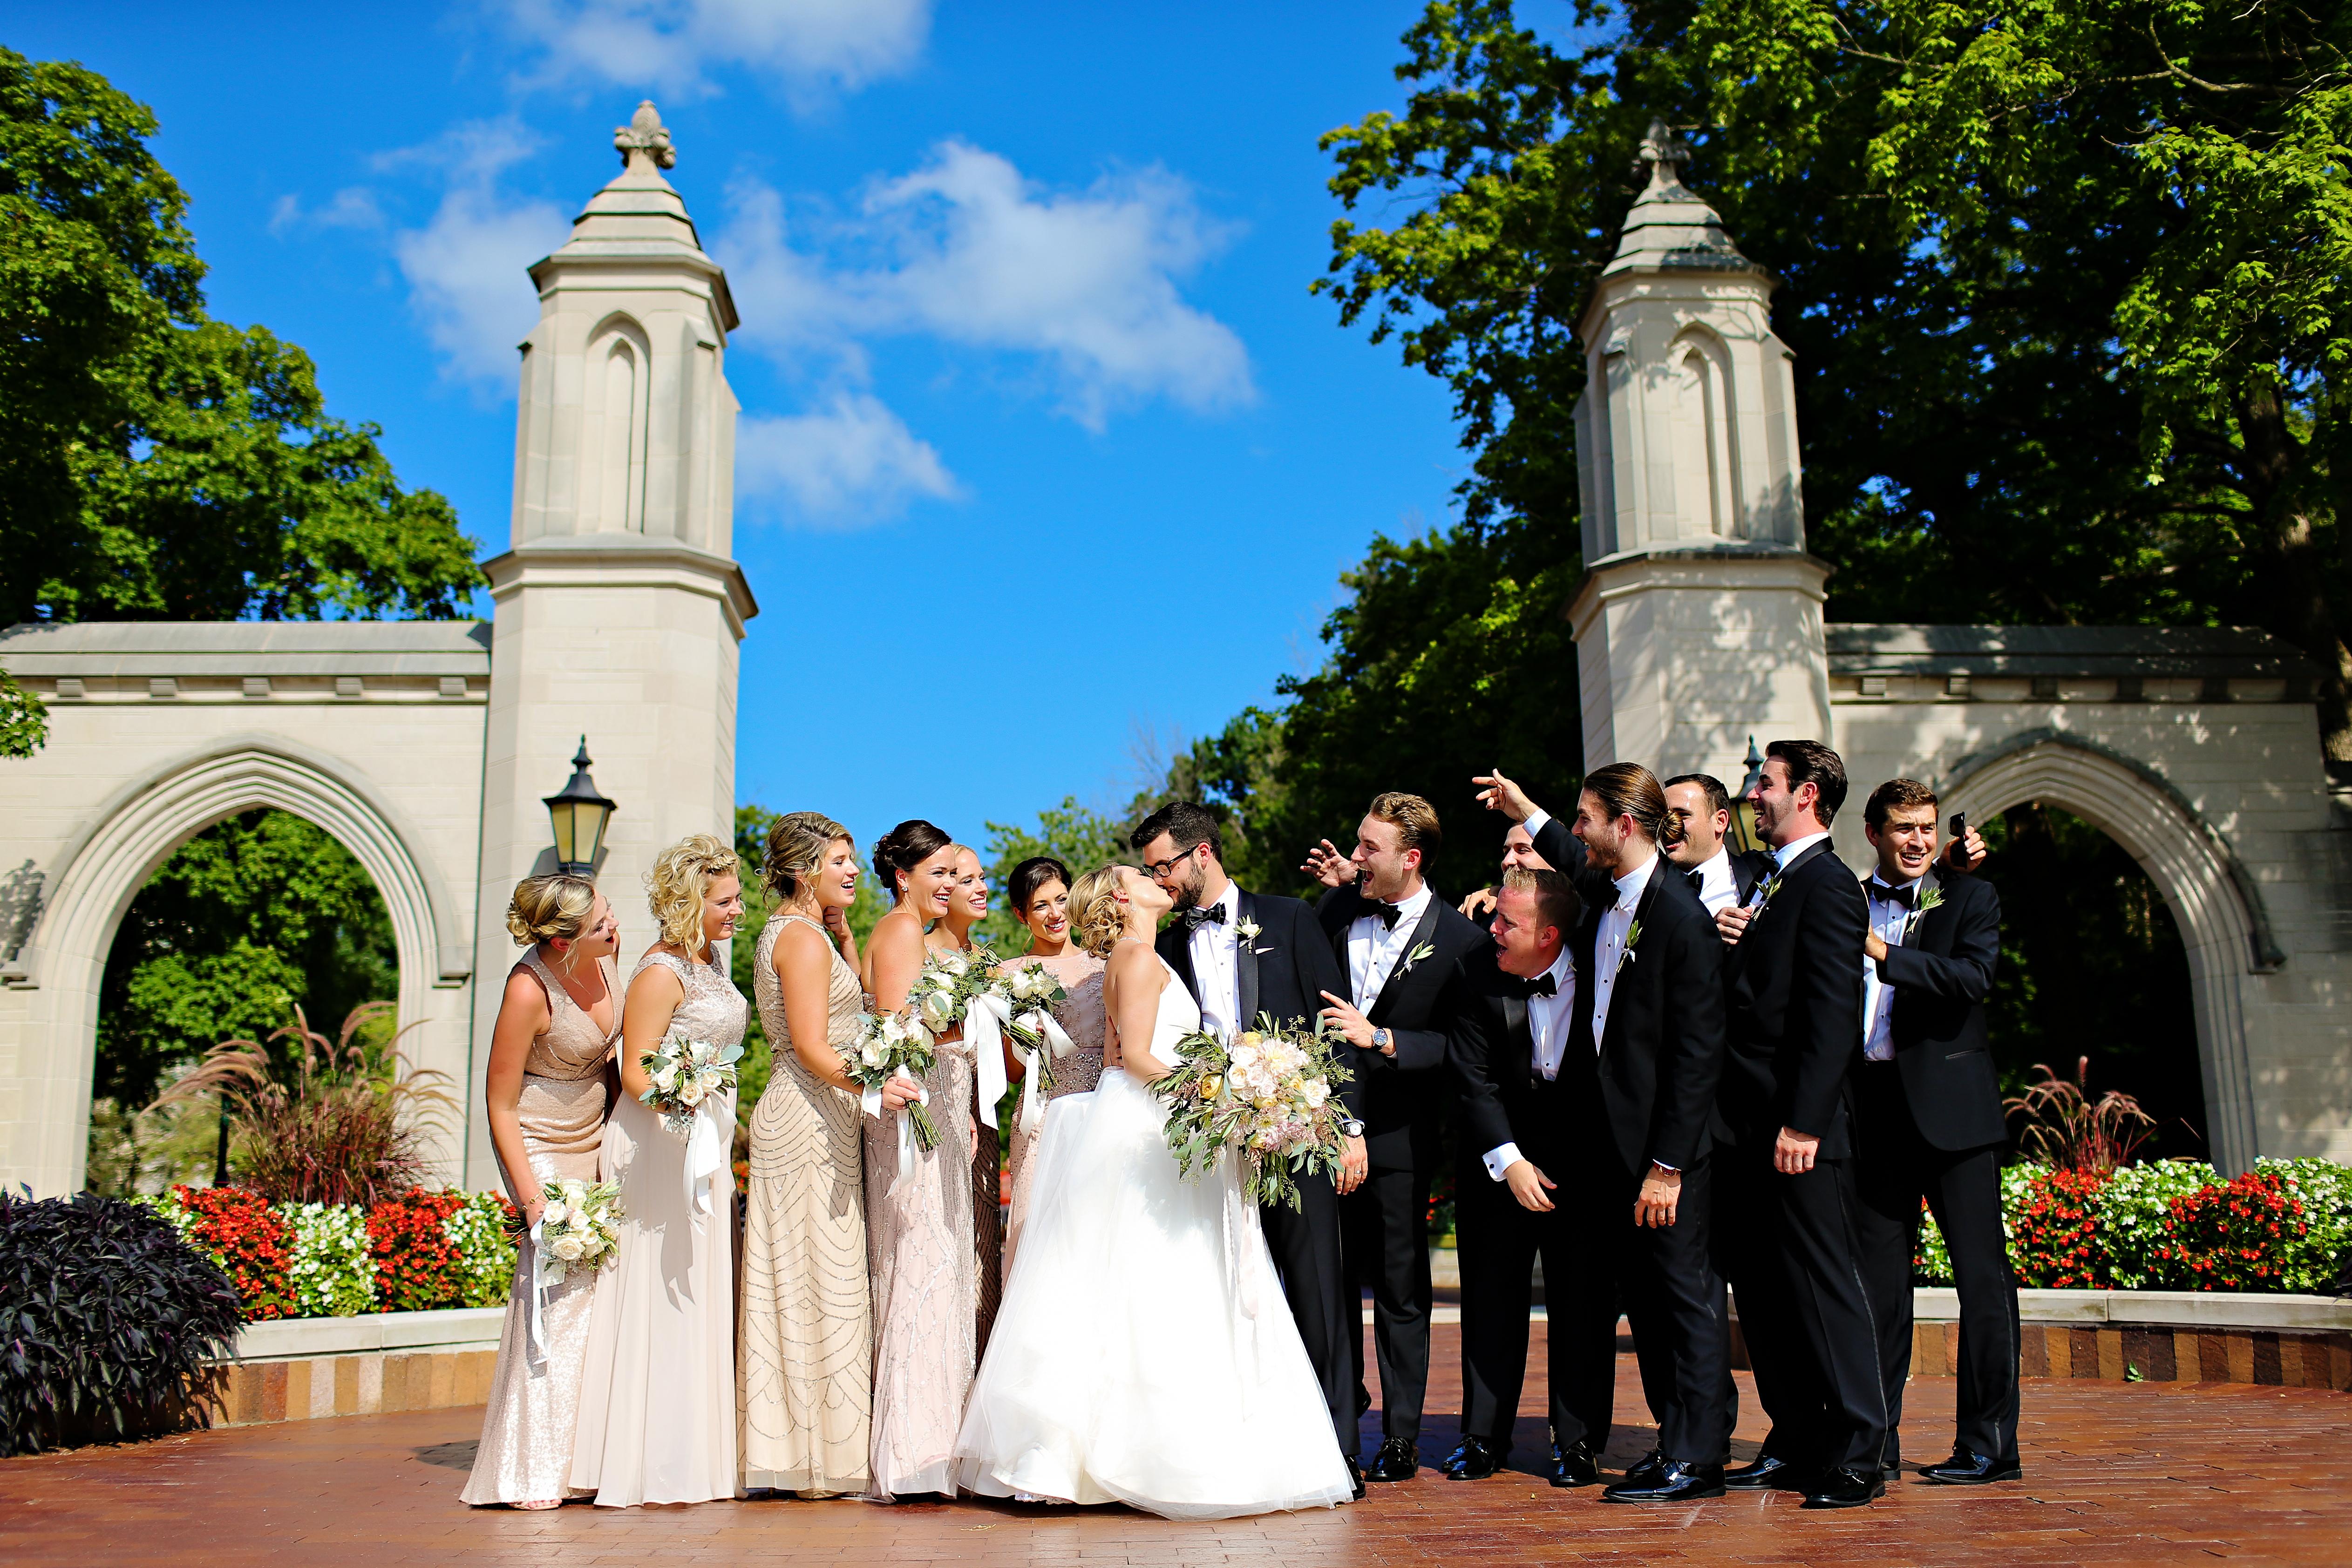 186 meaghan matt indiana university wedding